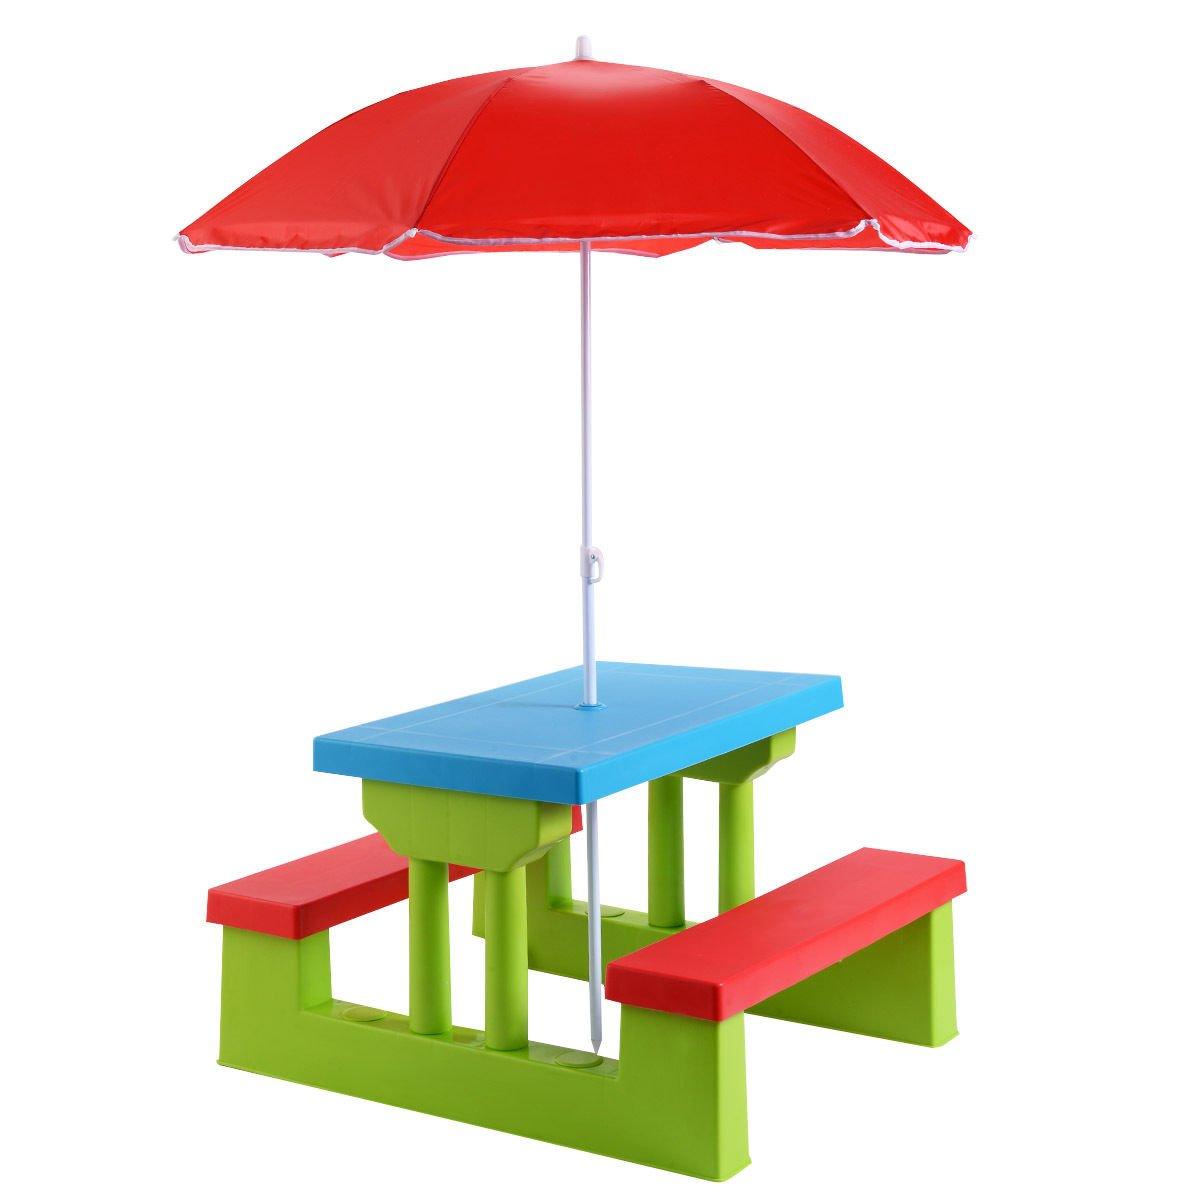 4 Seat KidsピクニックテーブルW /傘Garden Yard折りたたみ子供ベンチアウトドア B01LYR4F3I